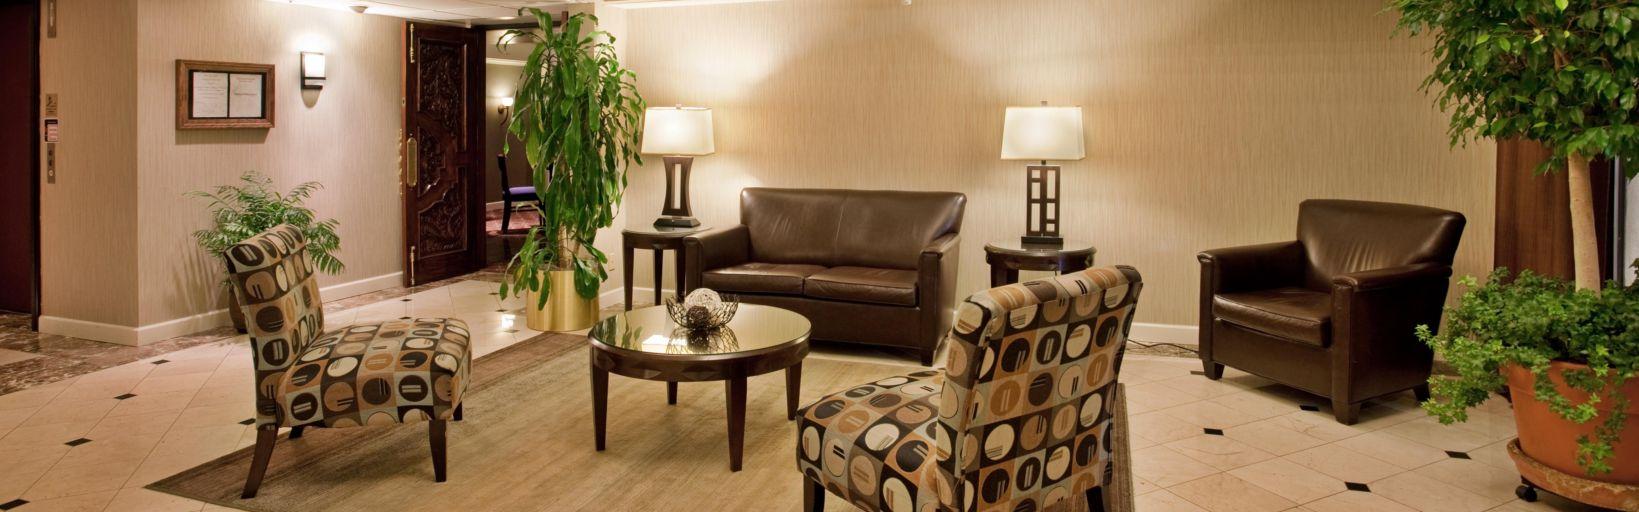 Hotel Lobby Holiday Inn St Louis Airport